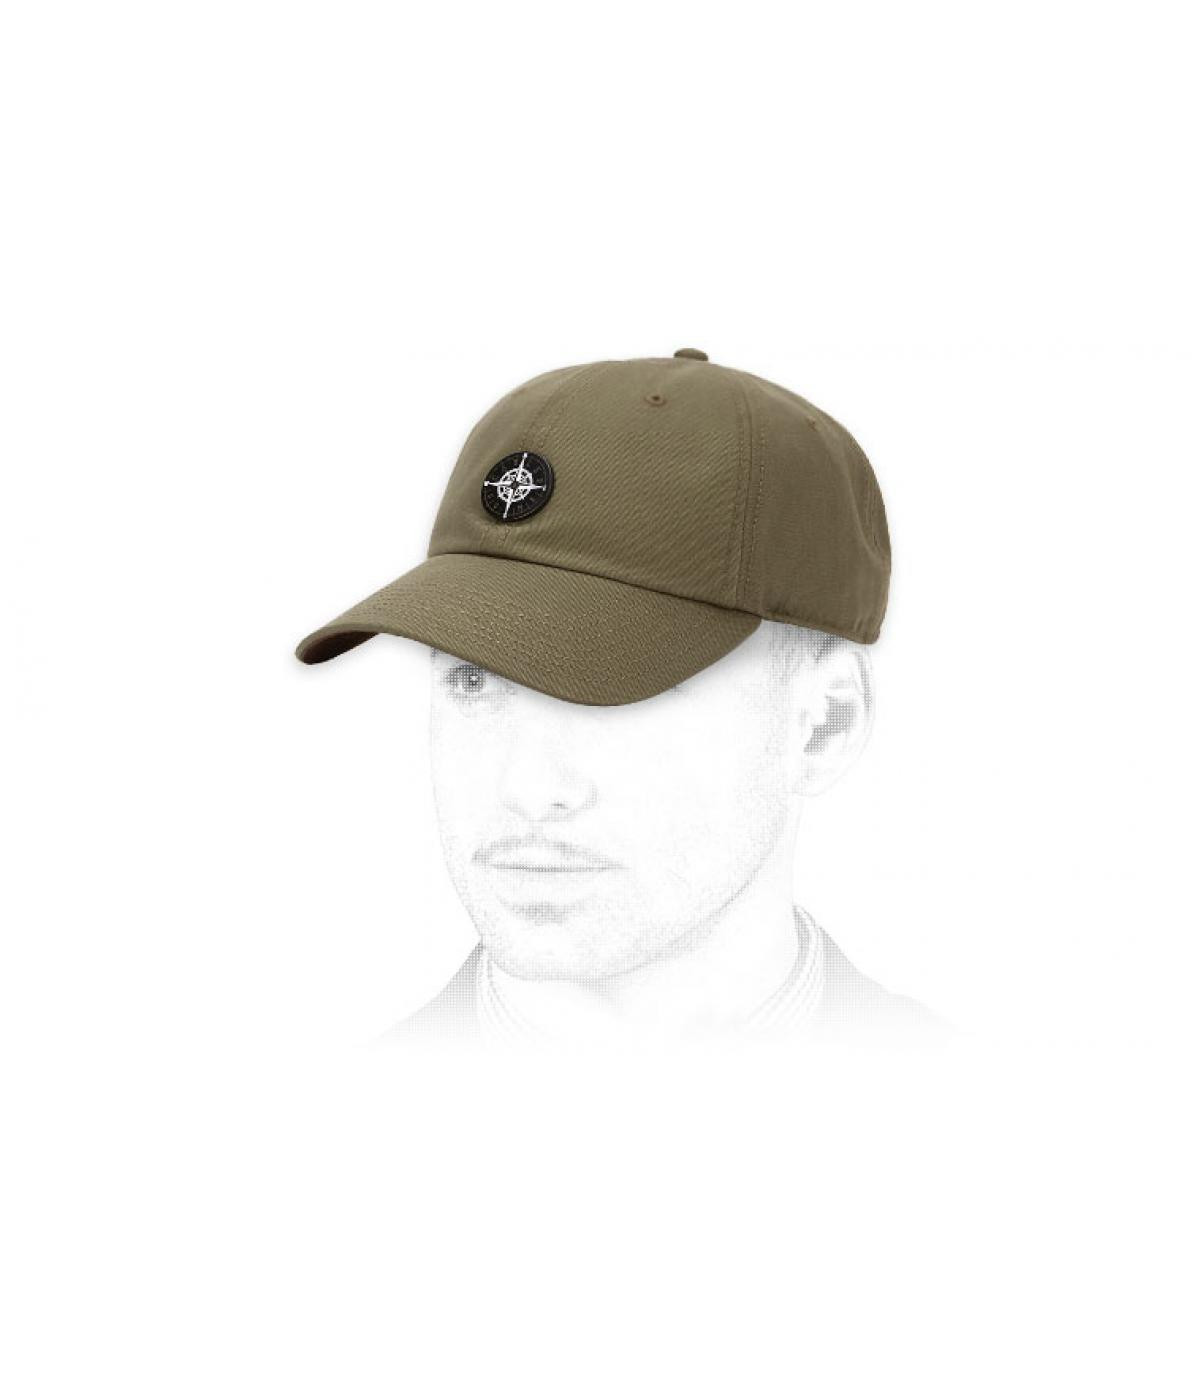 Cayler compass rose cap